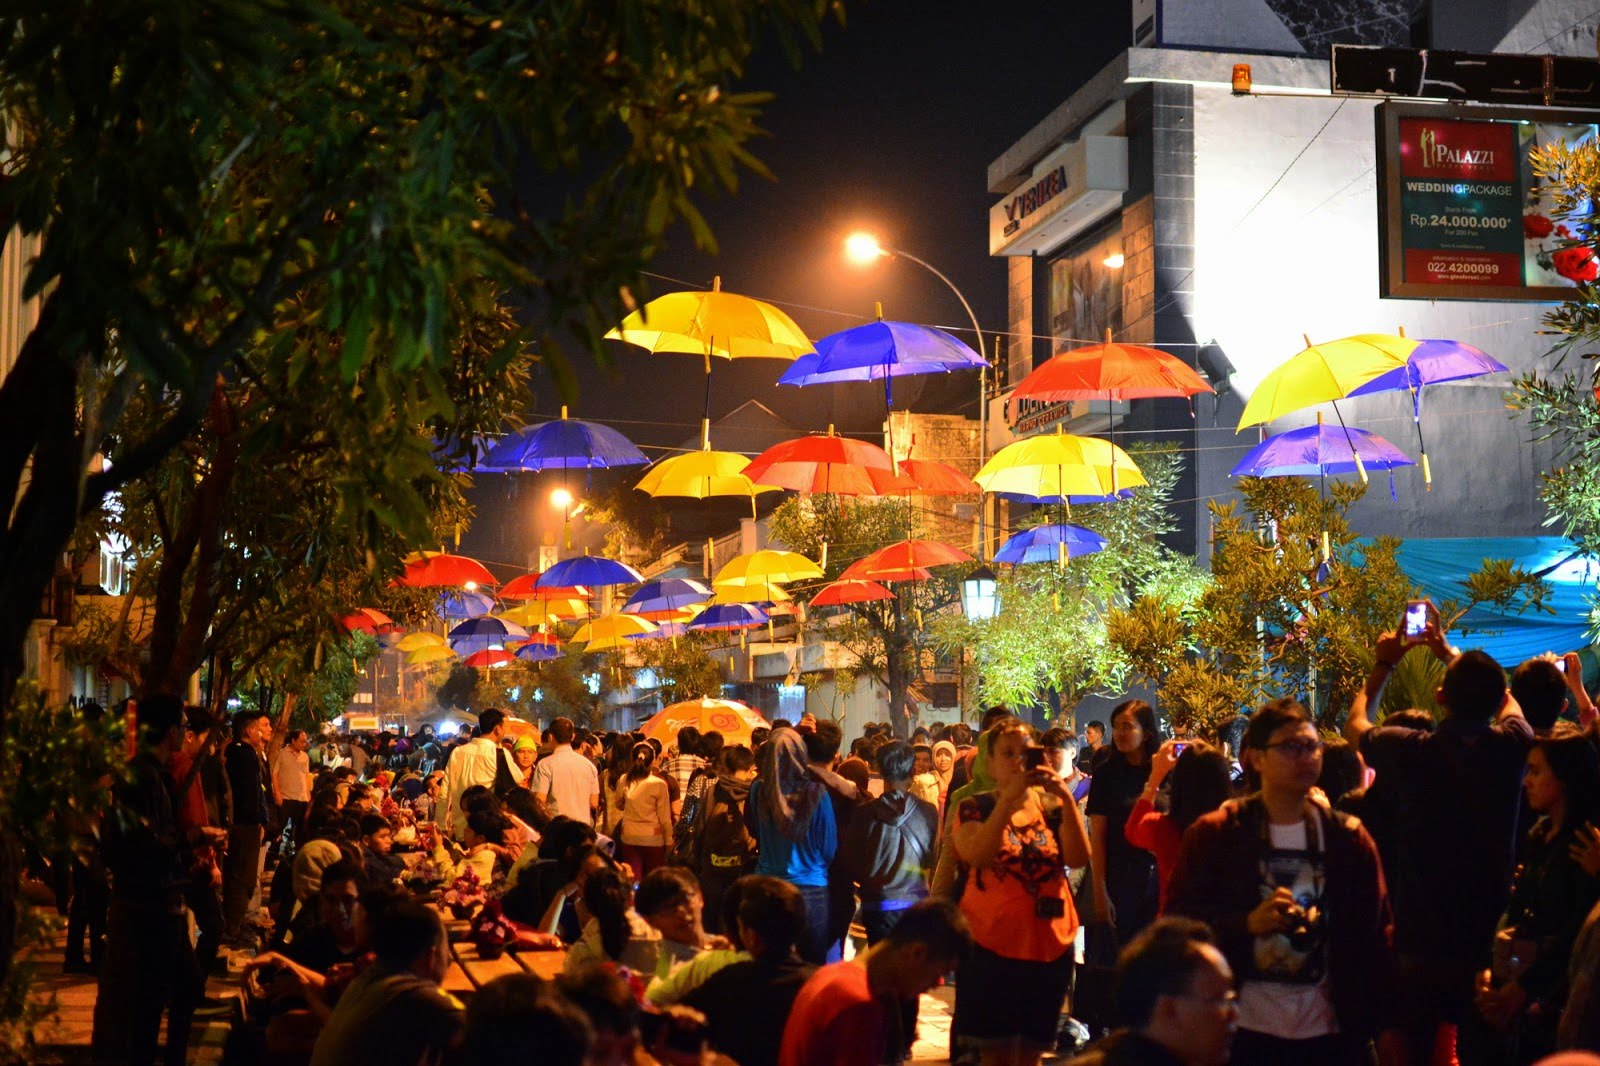 festival jalan braga bandung